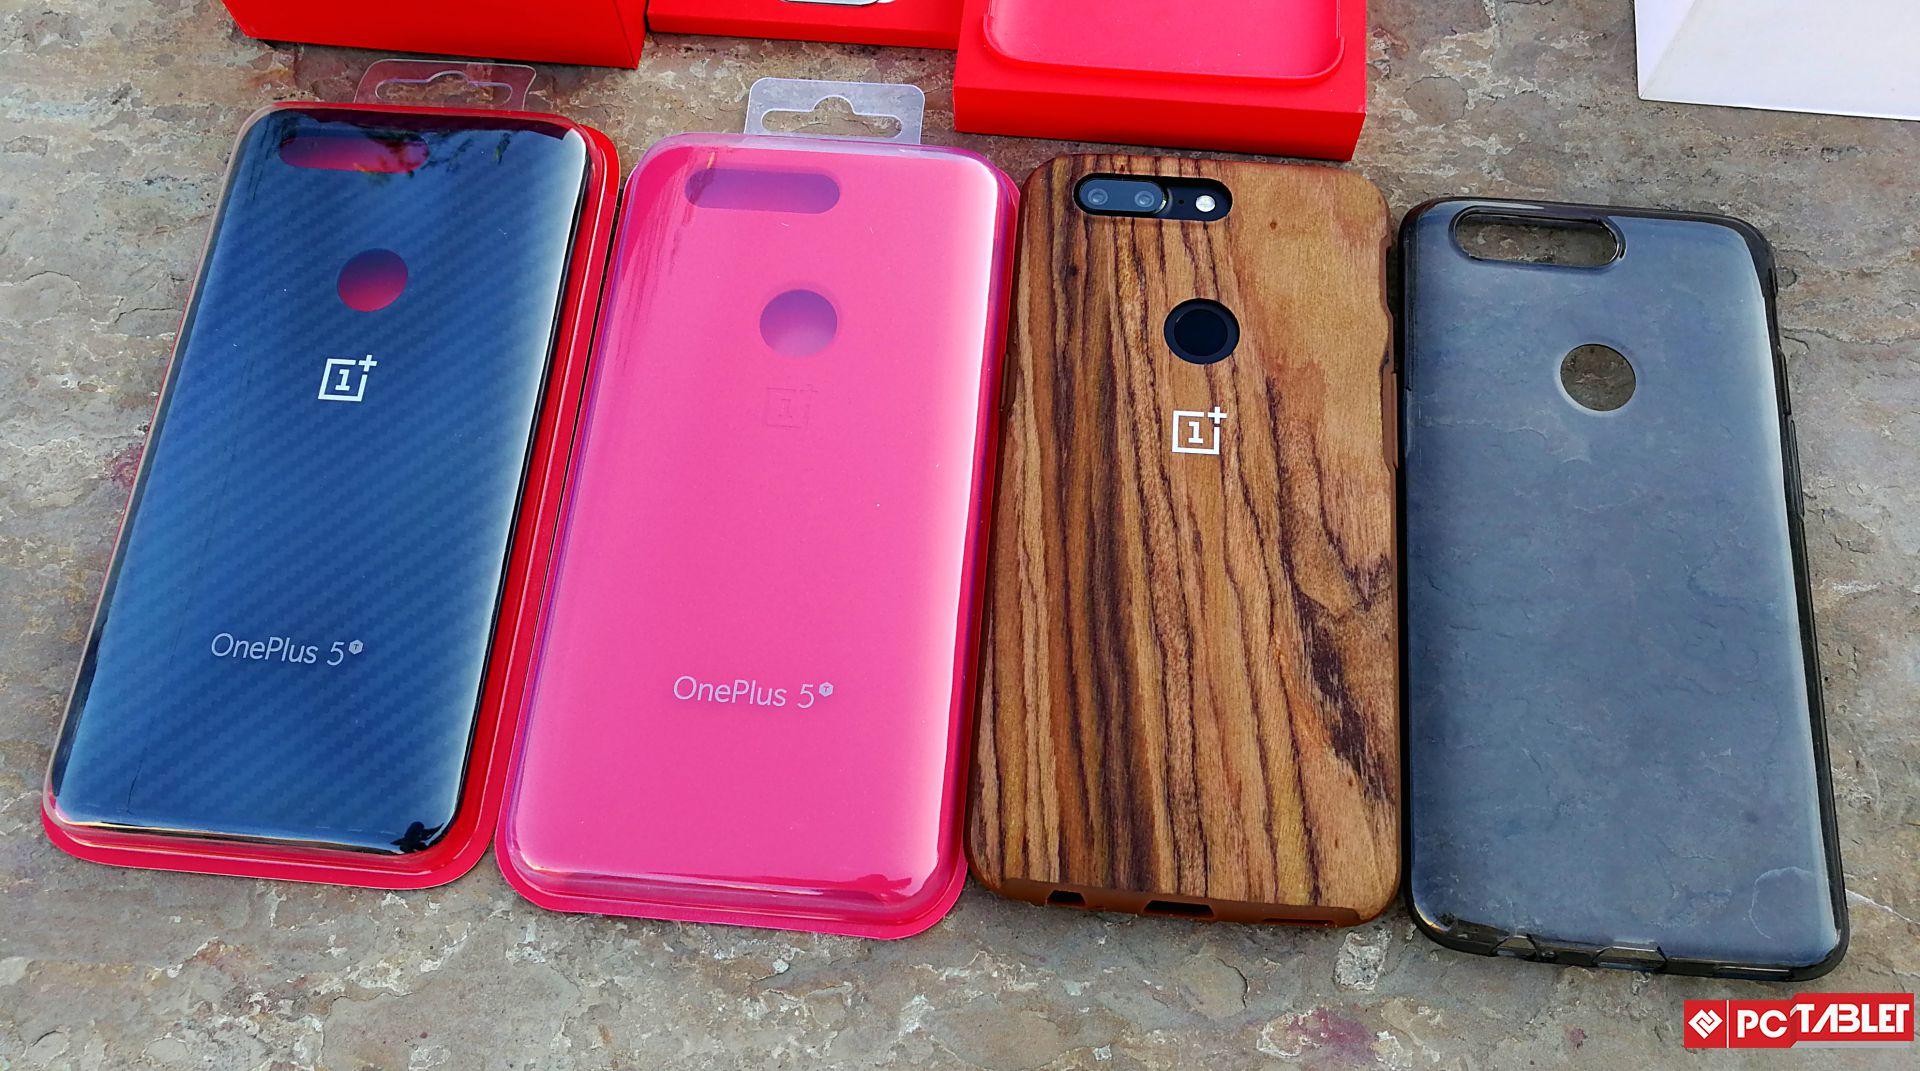 OnePlus 5T 18